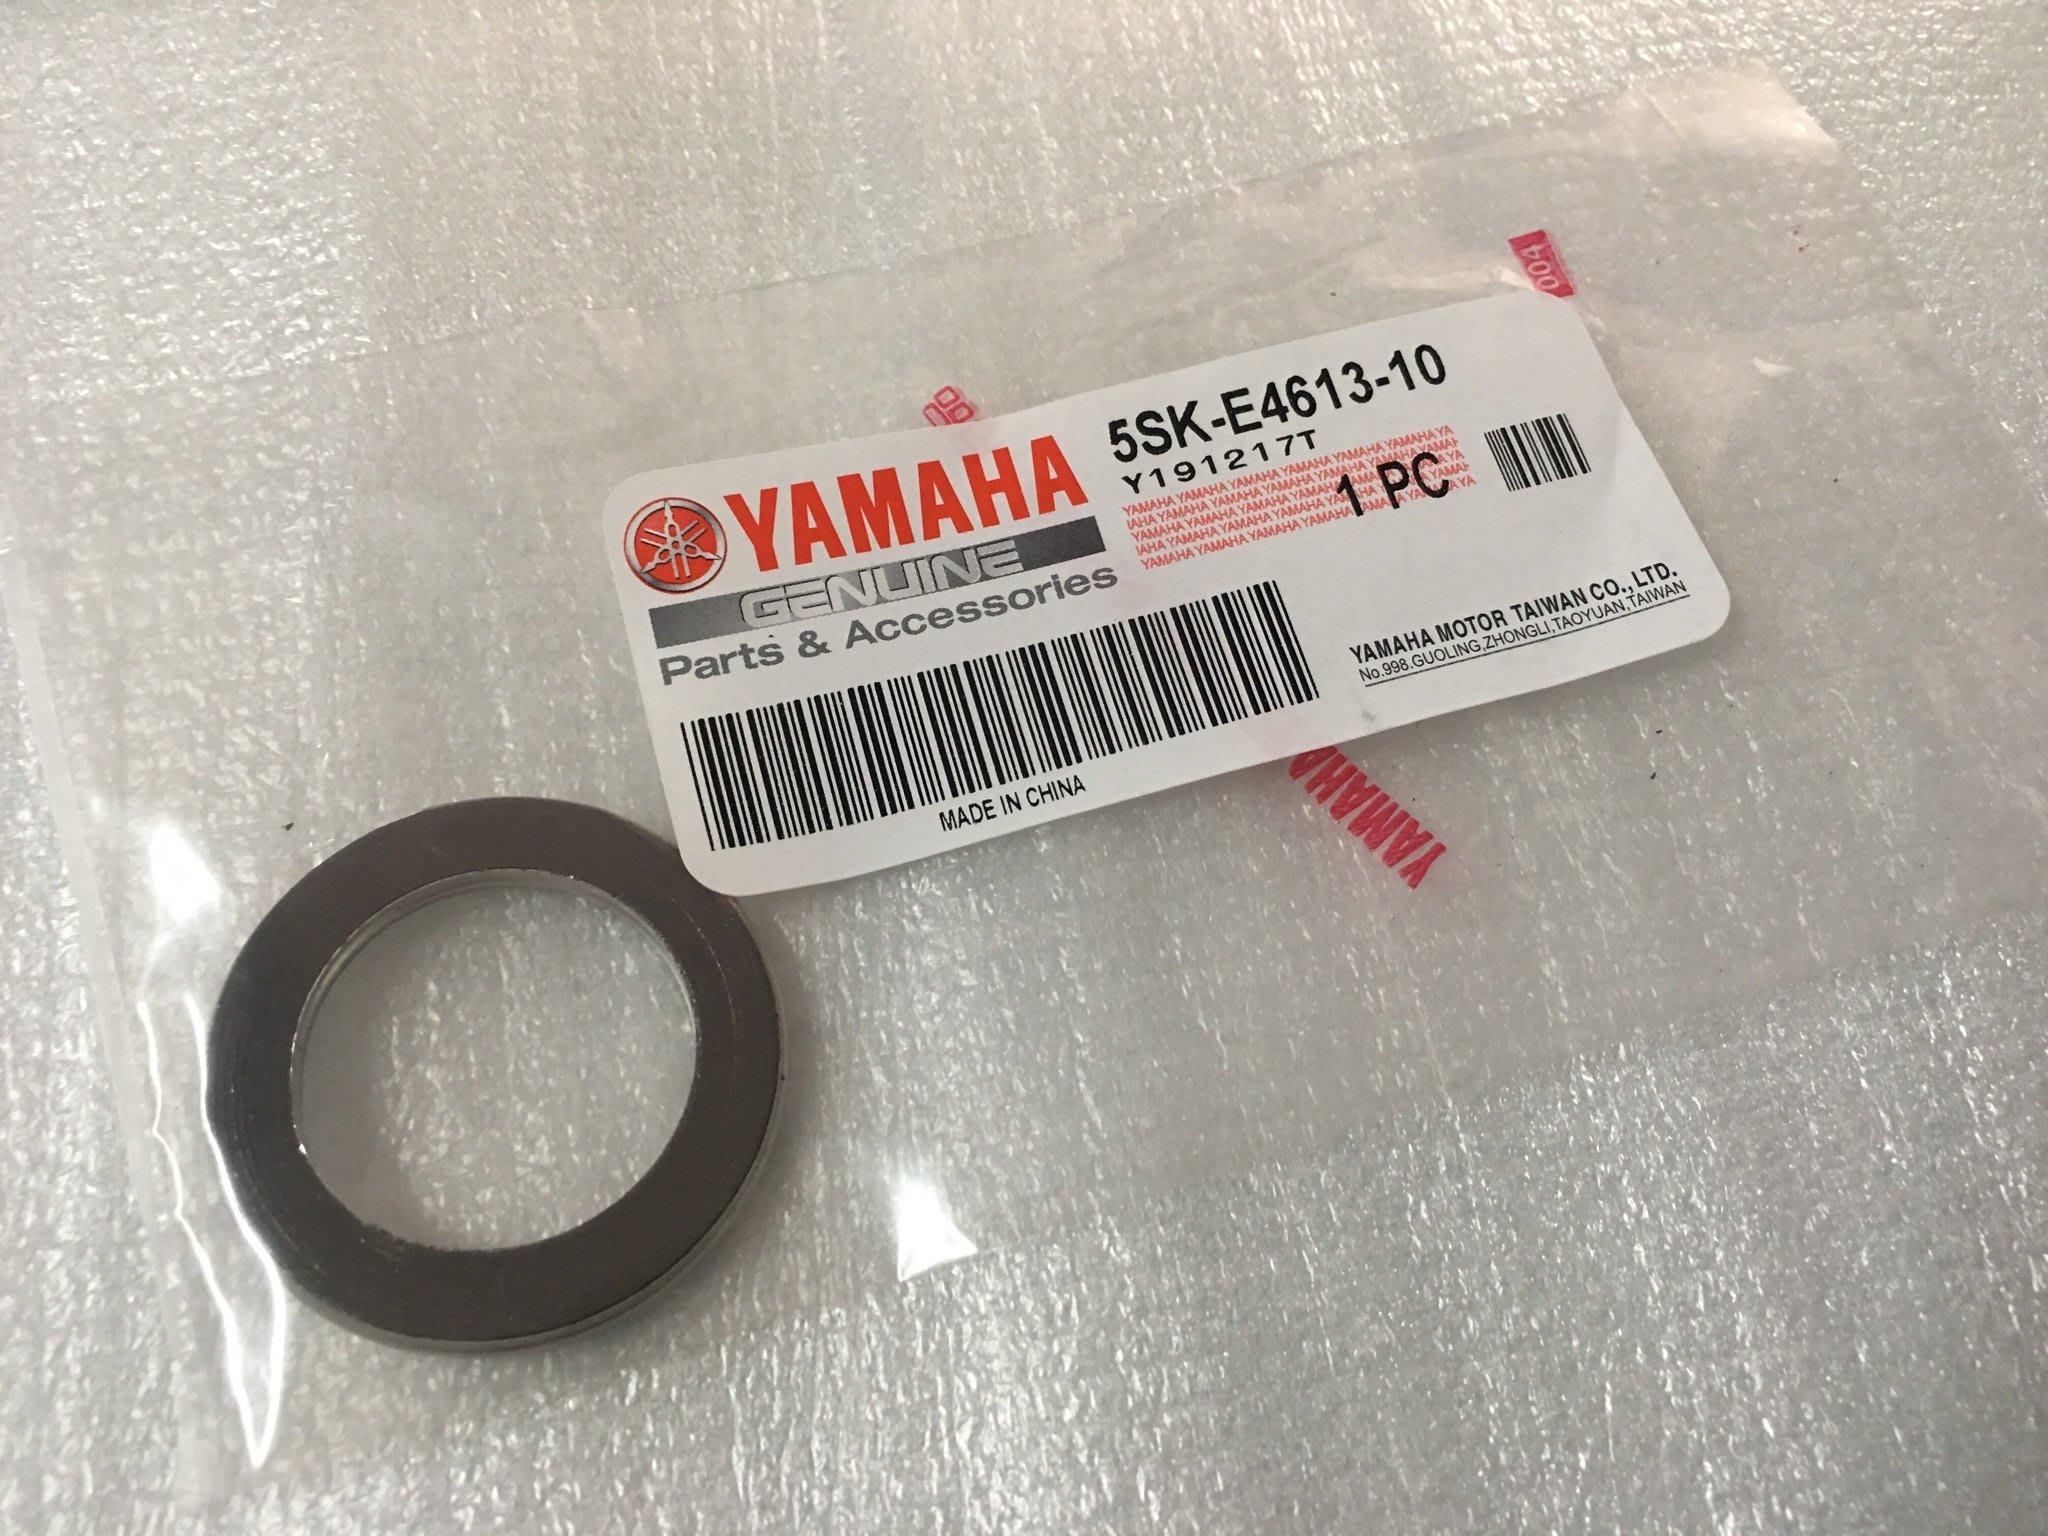 【JUST醬家】YAMAHA 原廠 RS RSZ CUXI Jogsweet100 排氣管墊片